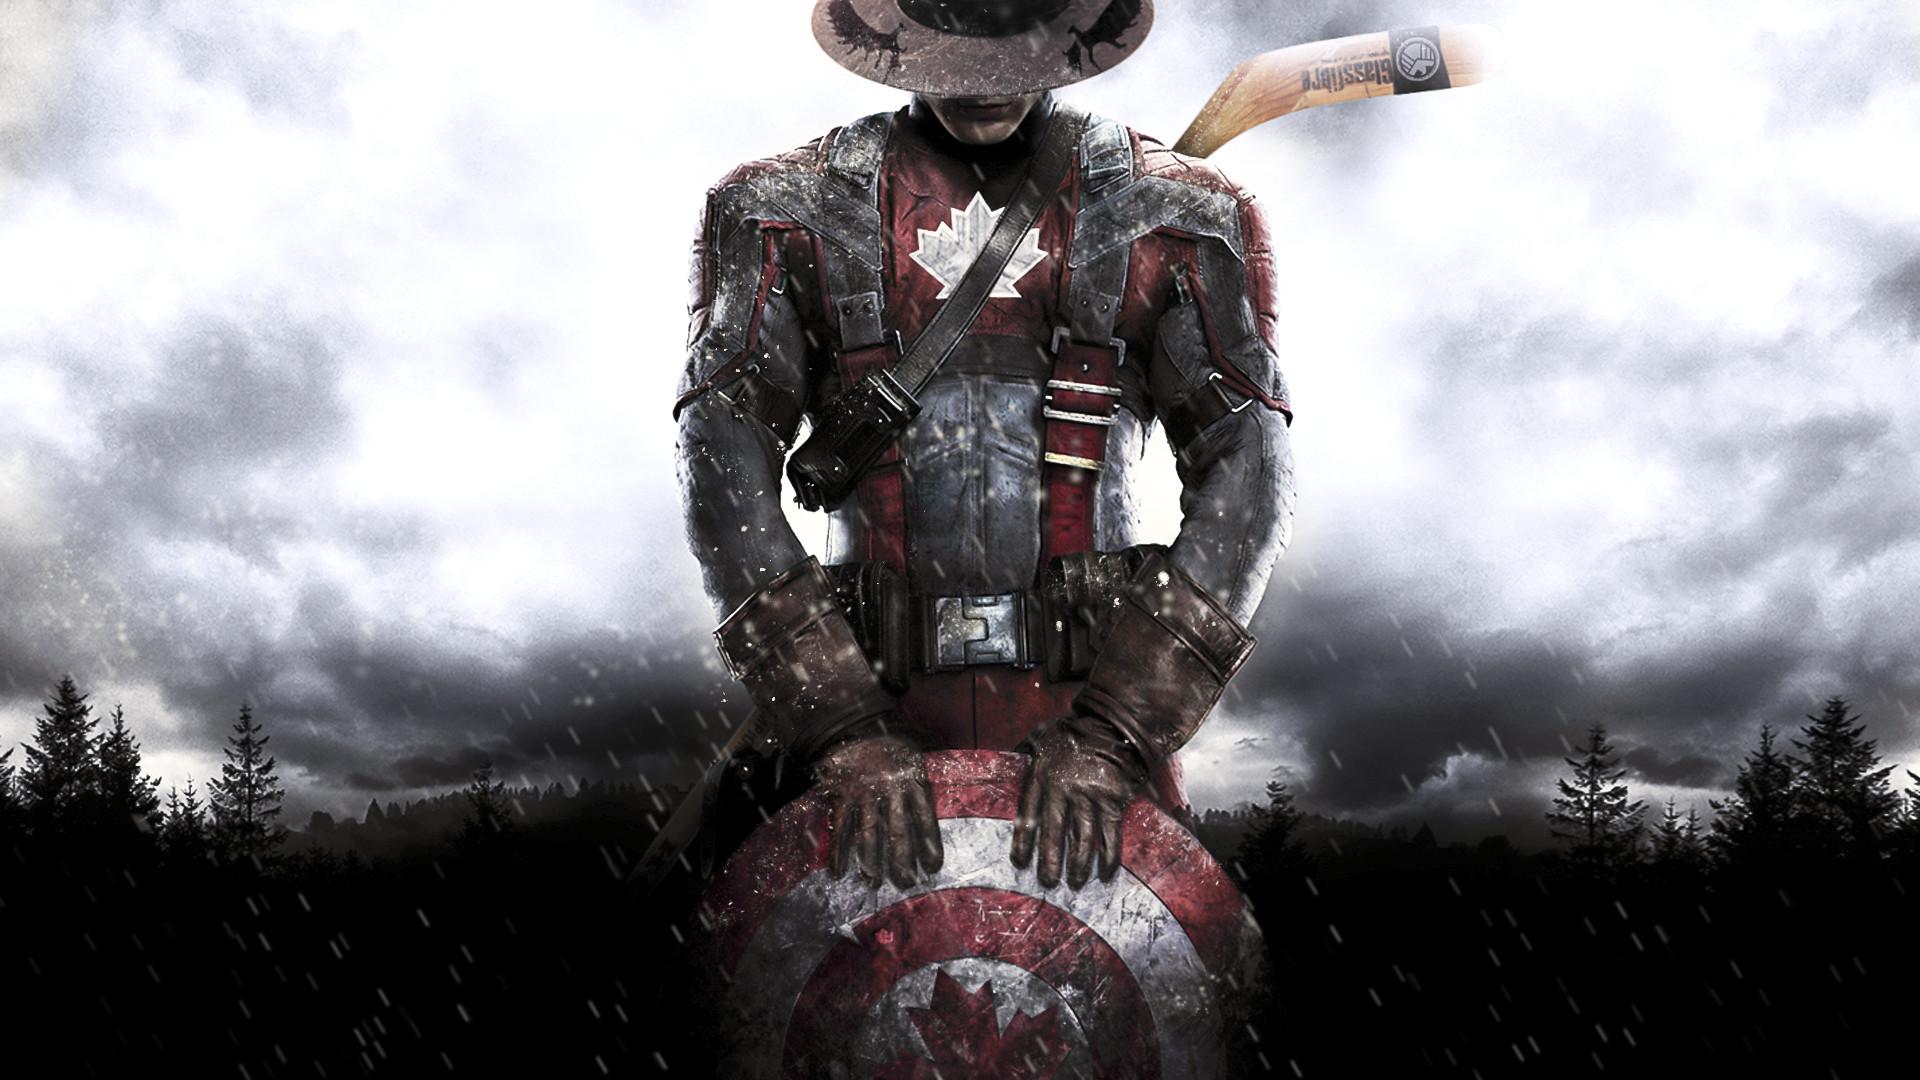 Badass America Wallpaper (72+ images)